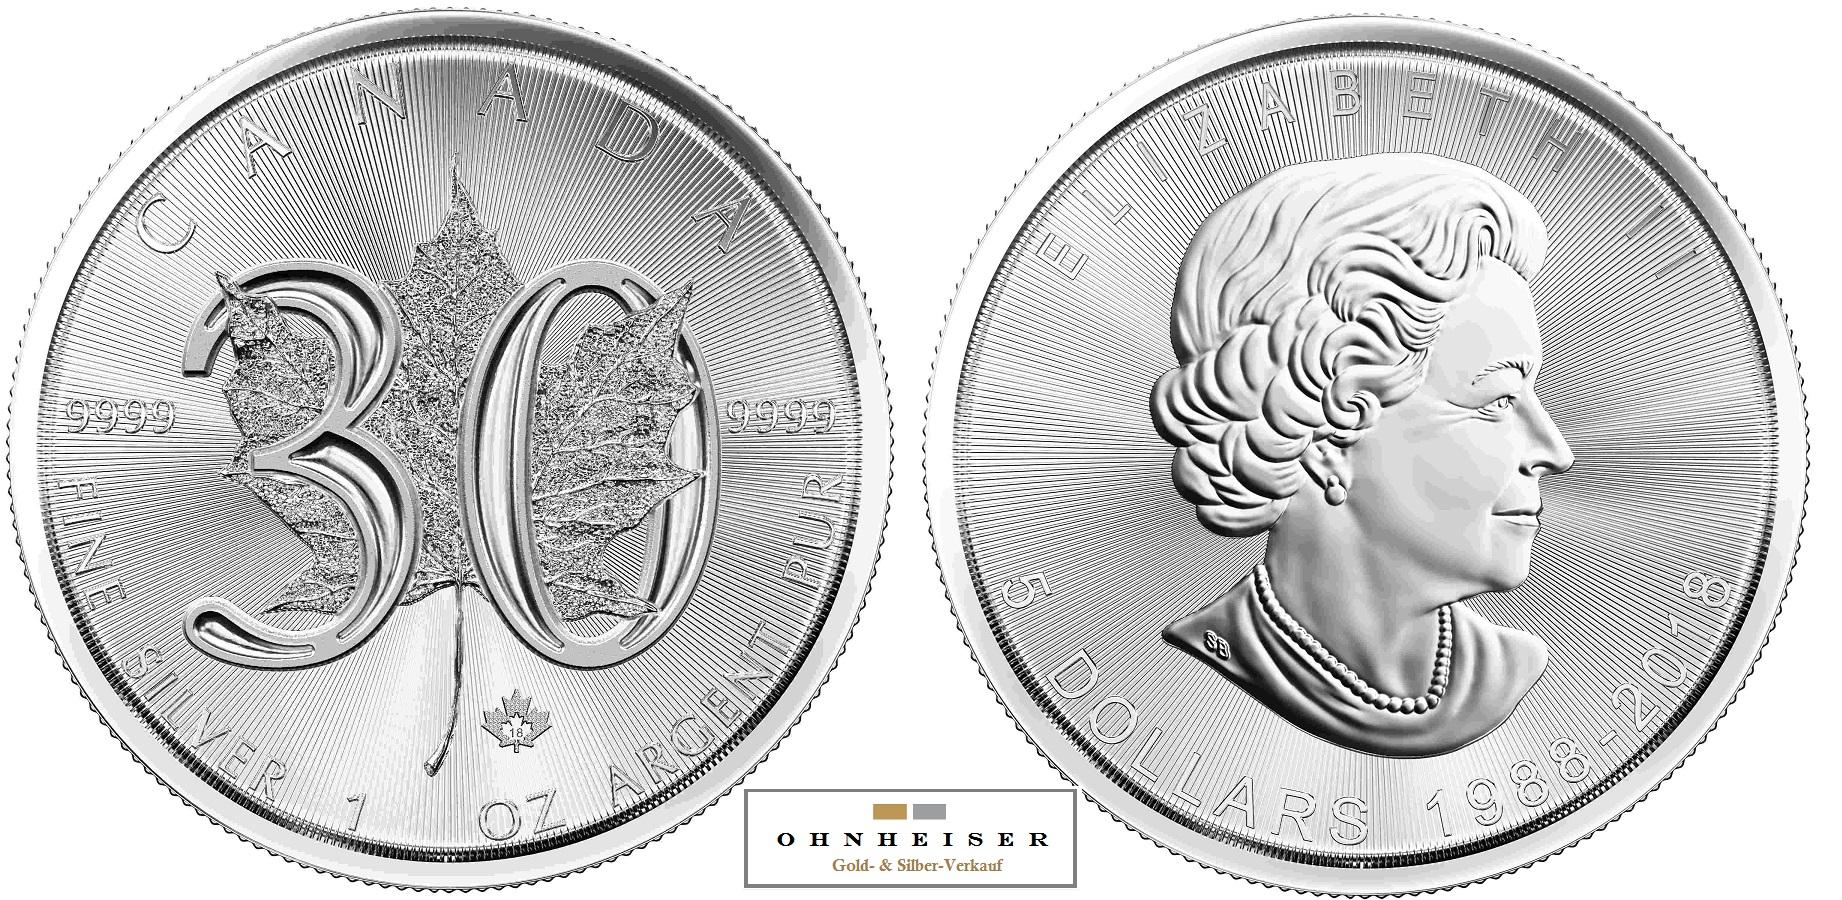 11 Oz Maple Leaf 30 Jahre Sonderprägung Tribute Coin 2018 Silber